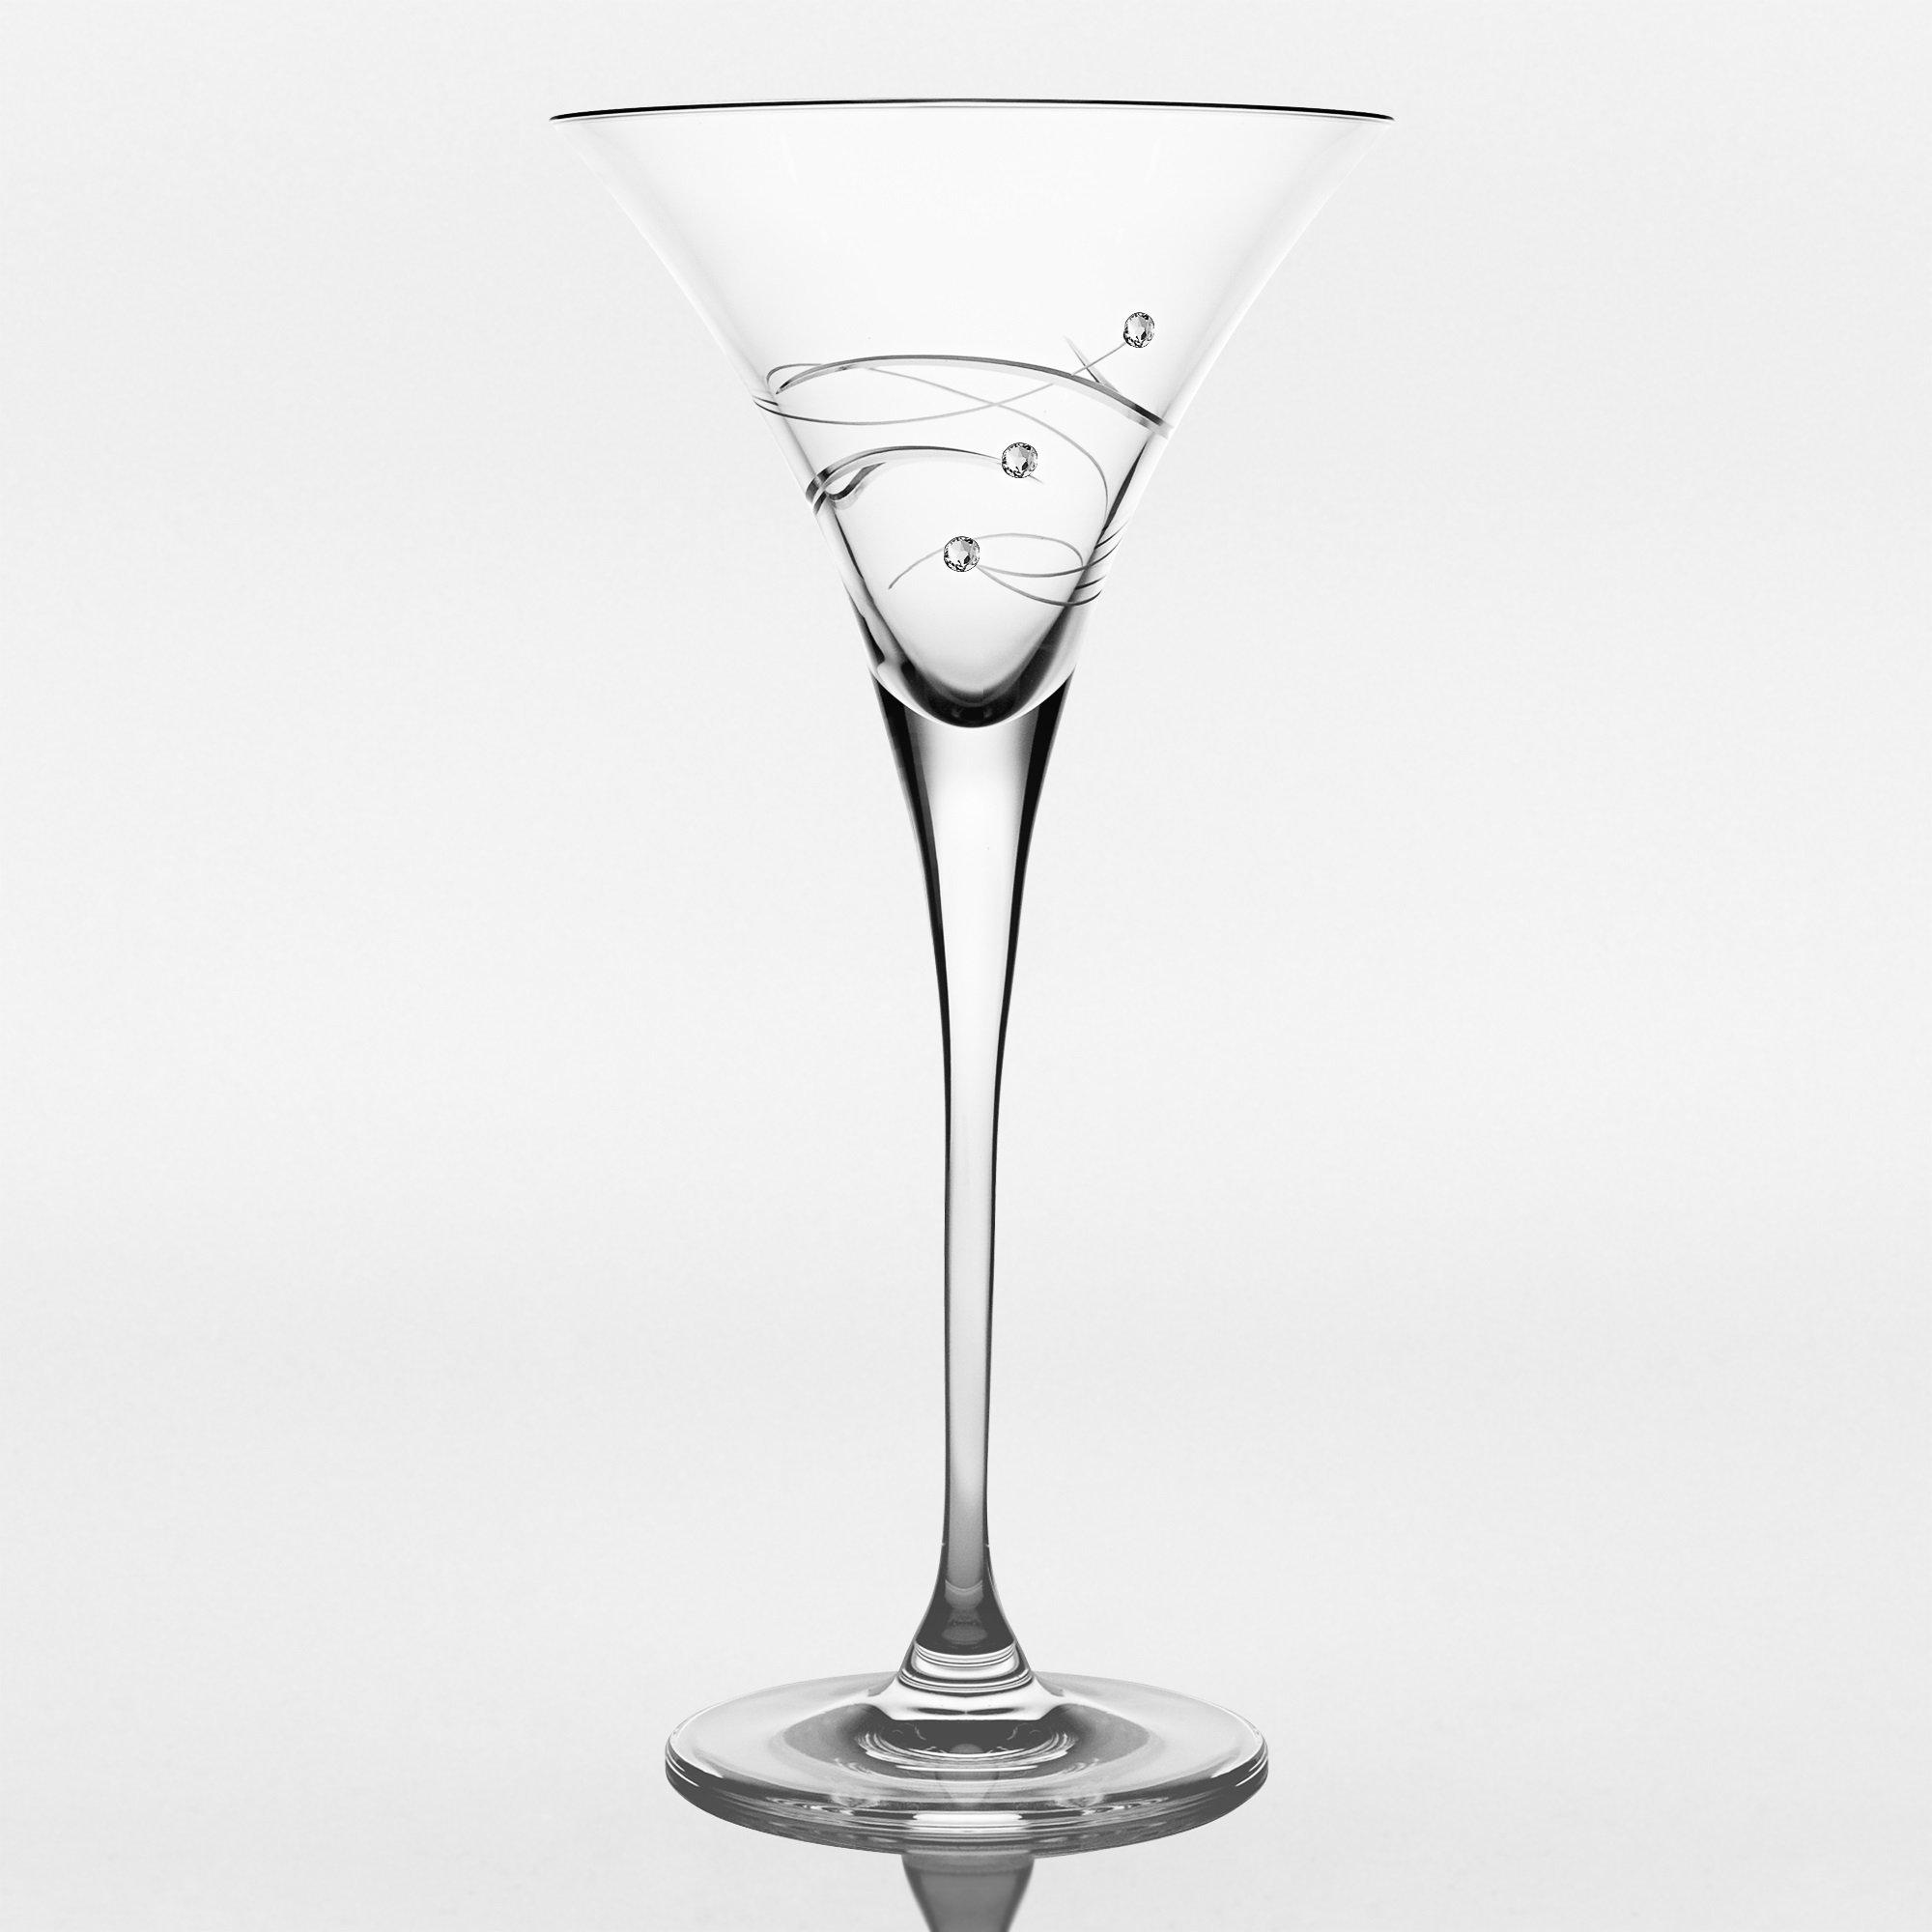 Barski - Handmade Glass - Sparkle - Martini Glass - Decorated with Real Swarovski Diamonds - Gift Boxed - 8.25 oz. - Made in Europe - Set of 2